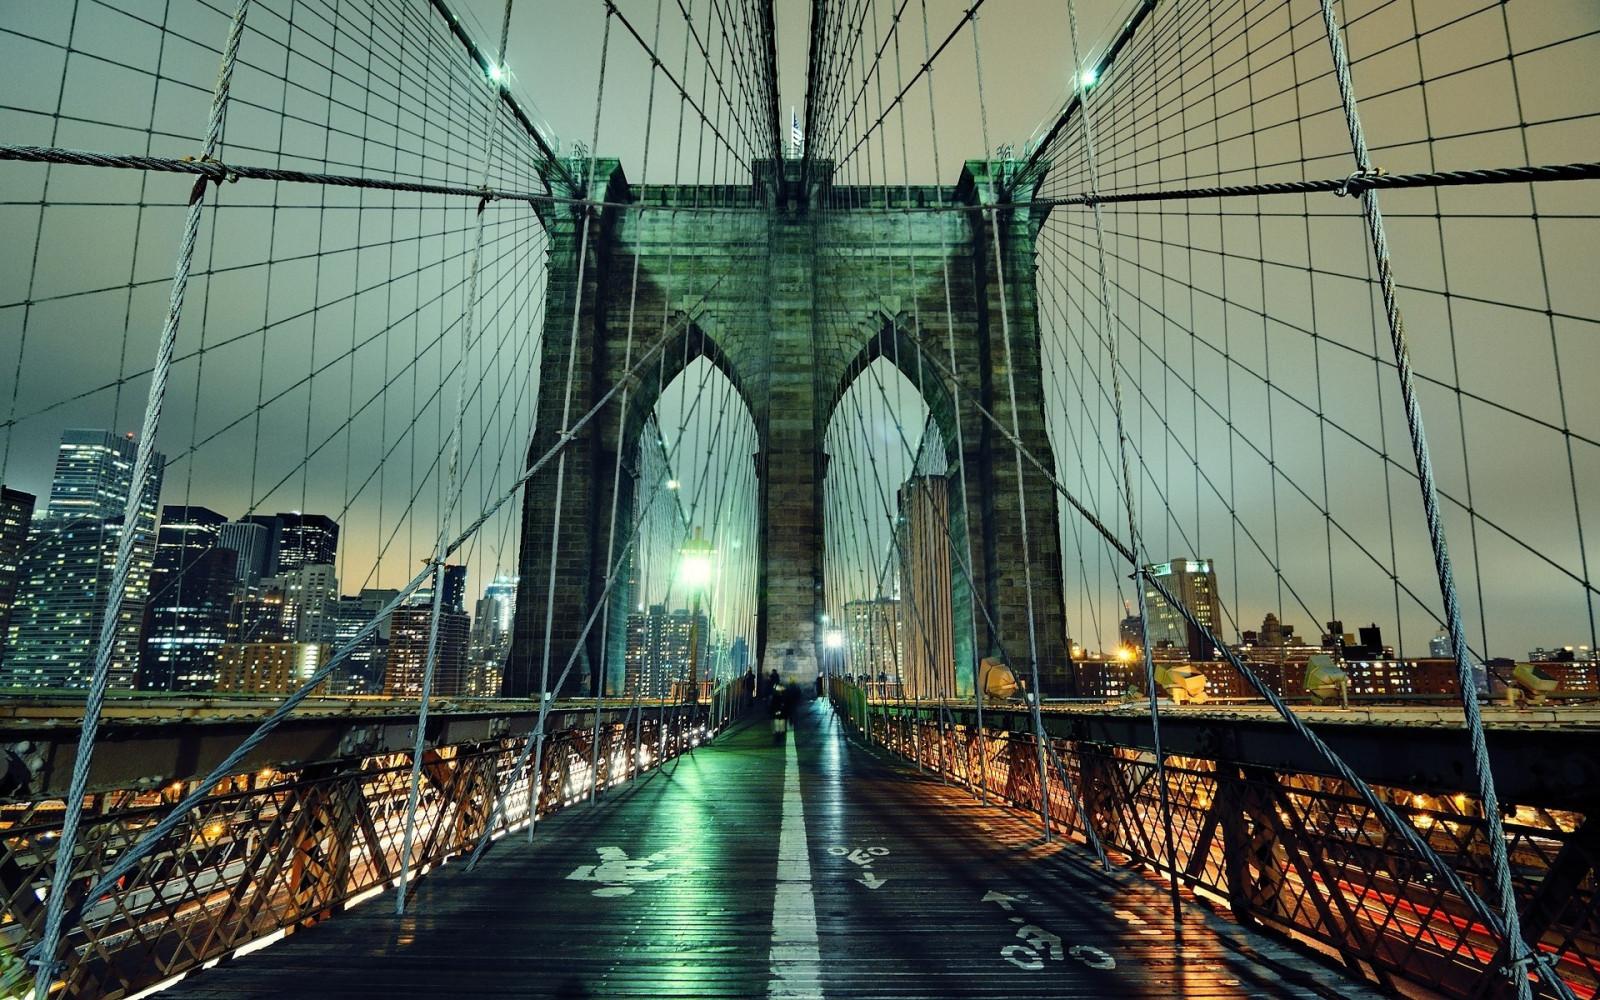 Simple Wallpaper Night Brooklyn Bridge - brooklyn_bridge_night_nyc_united_states-1087009  Gallery.jpg!d